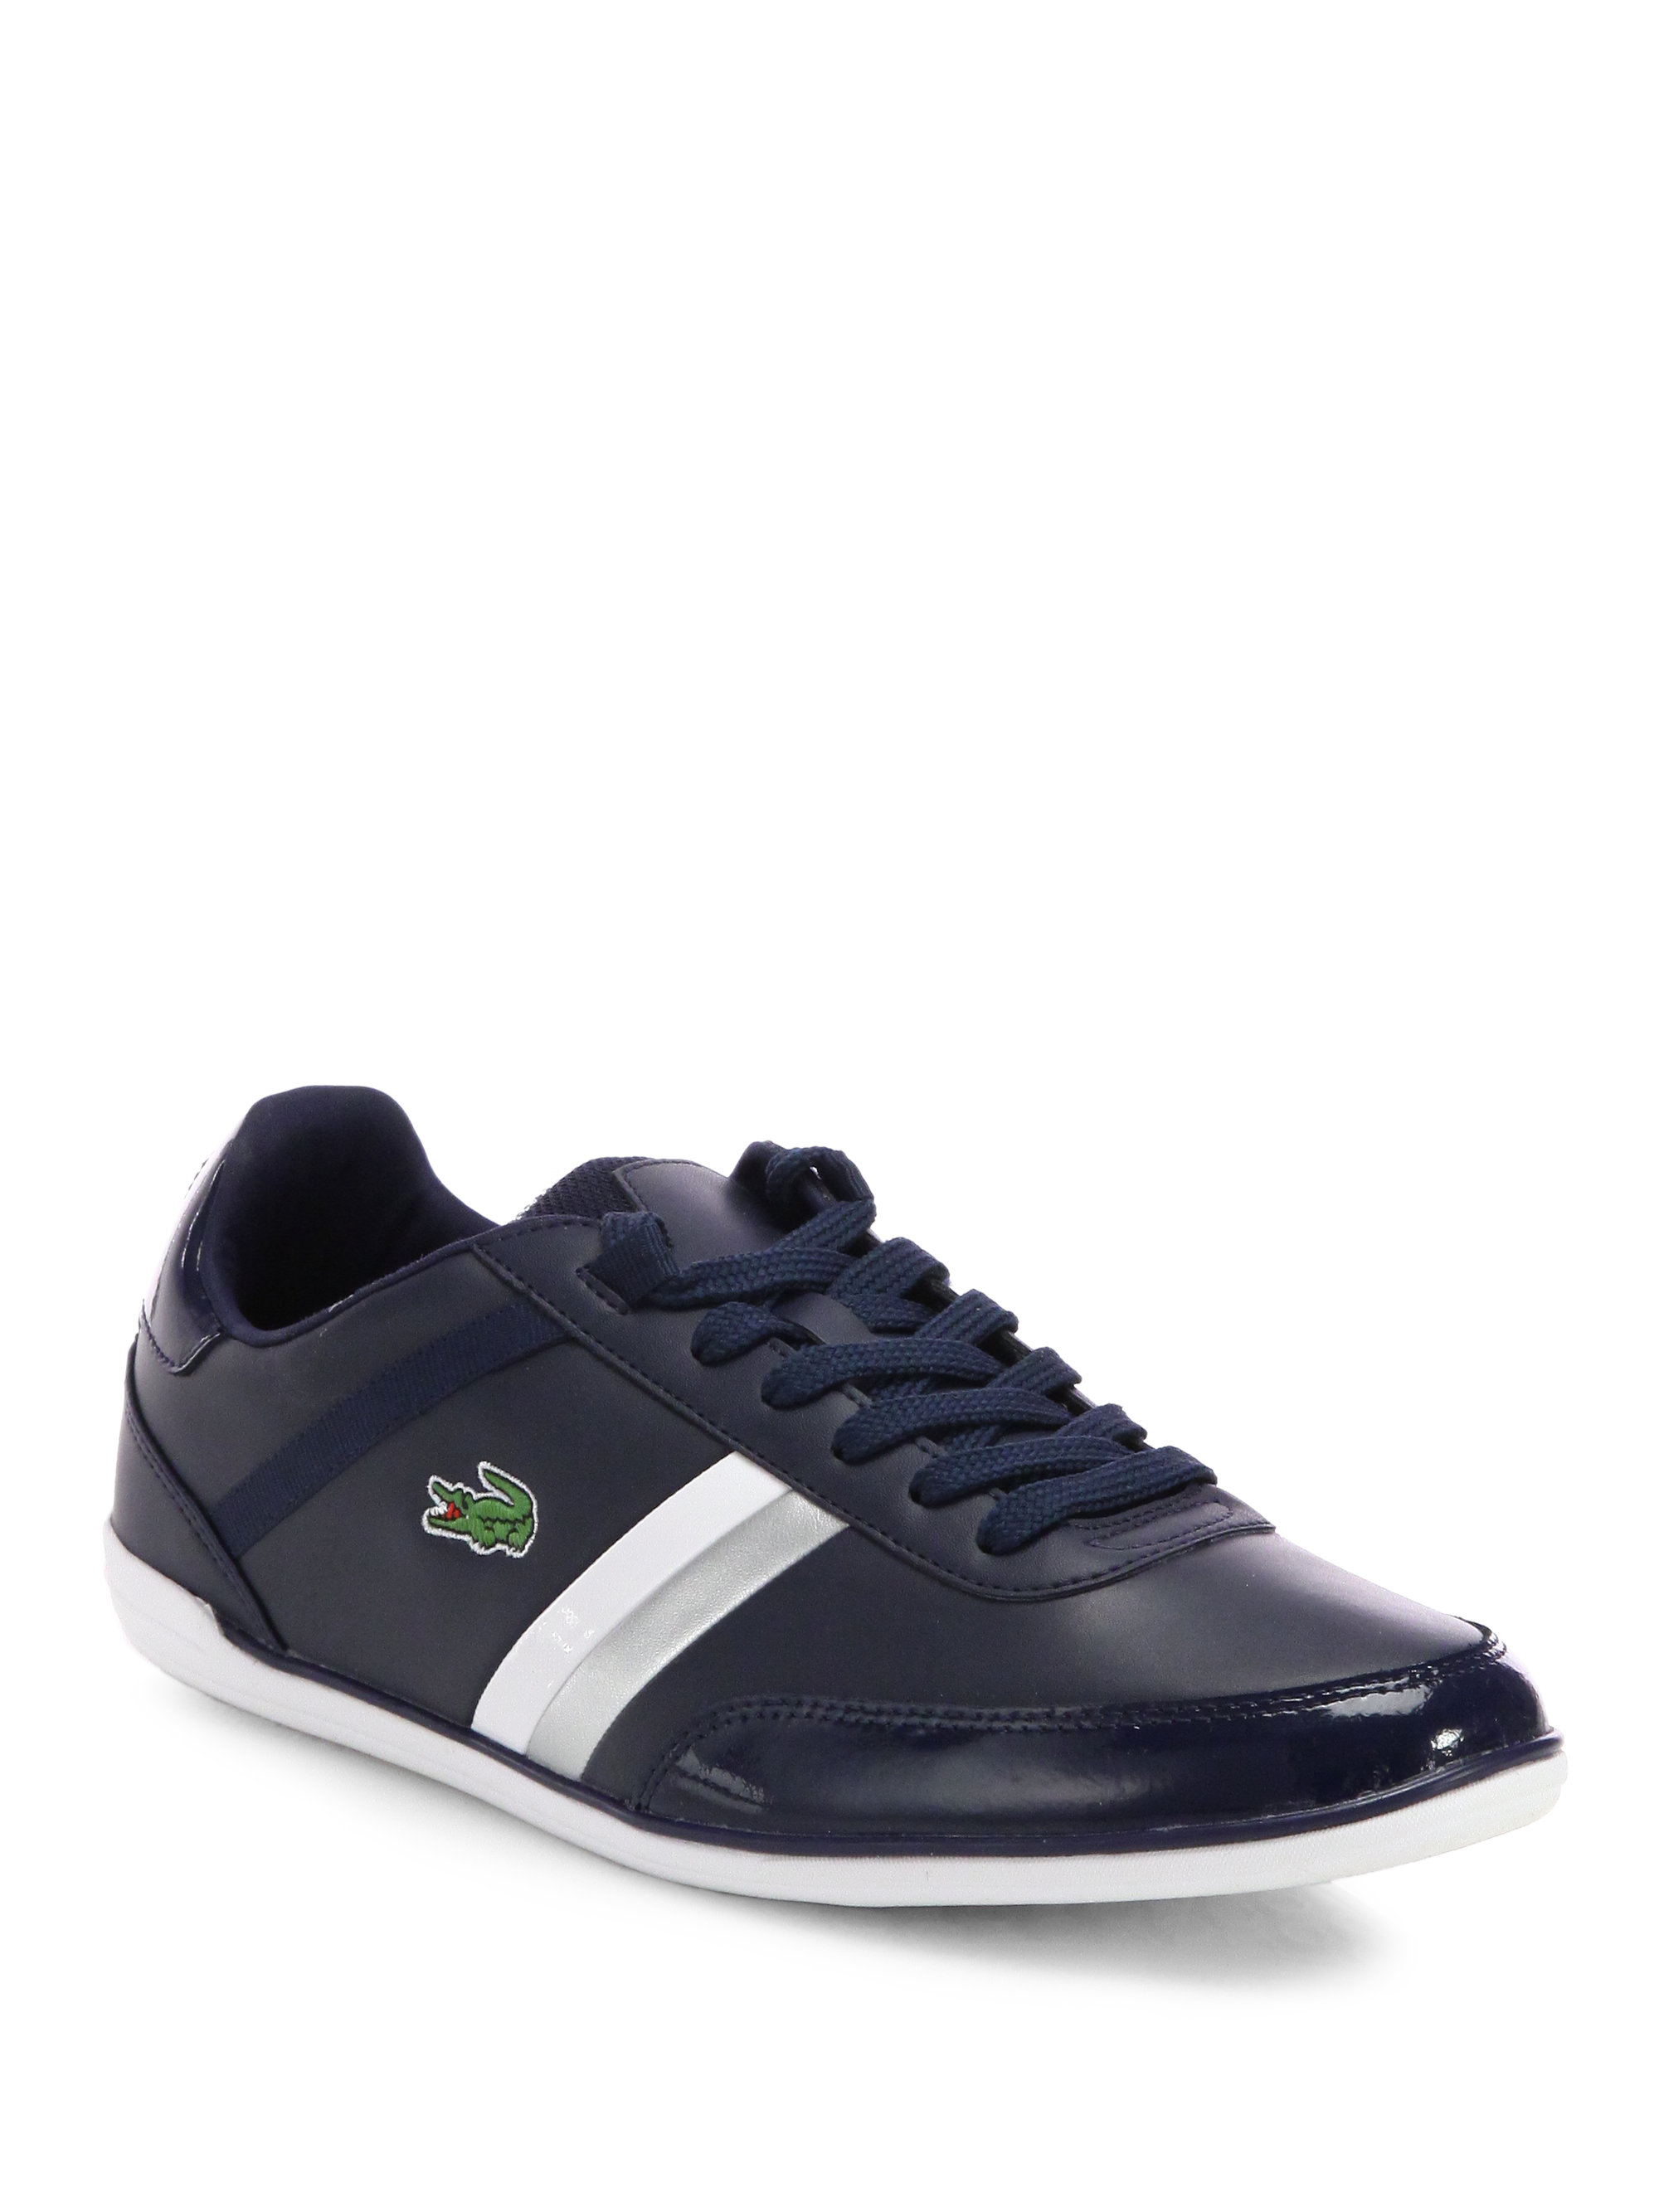 lacoste giron doublestripe sneakers in blue for men lyst. Black Bedroom Furniture Sets. Home Design Ideas